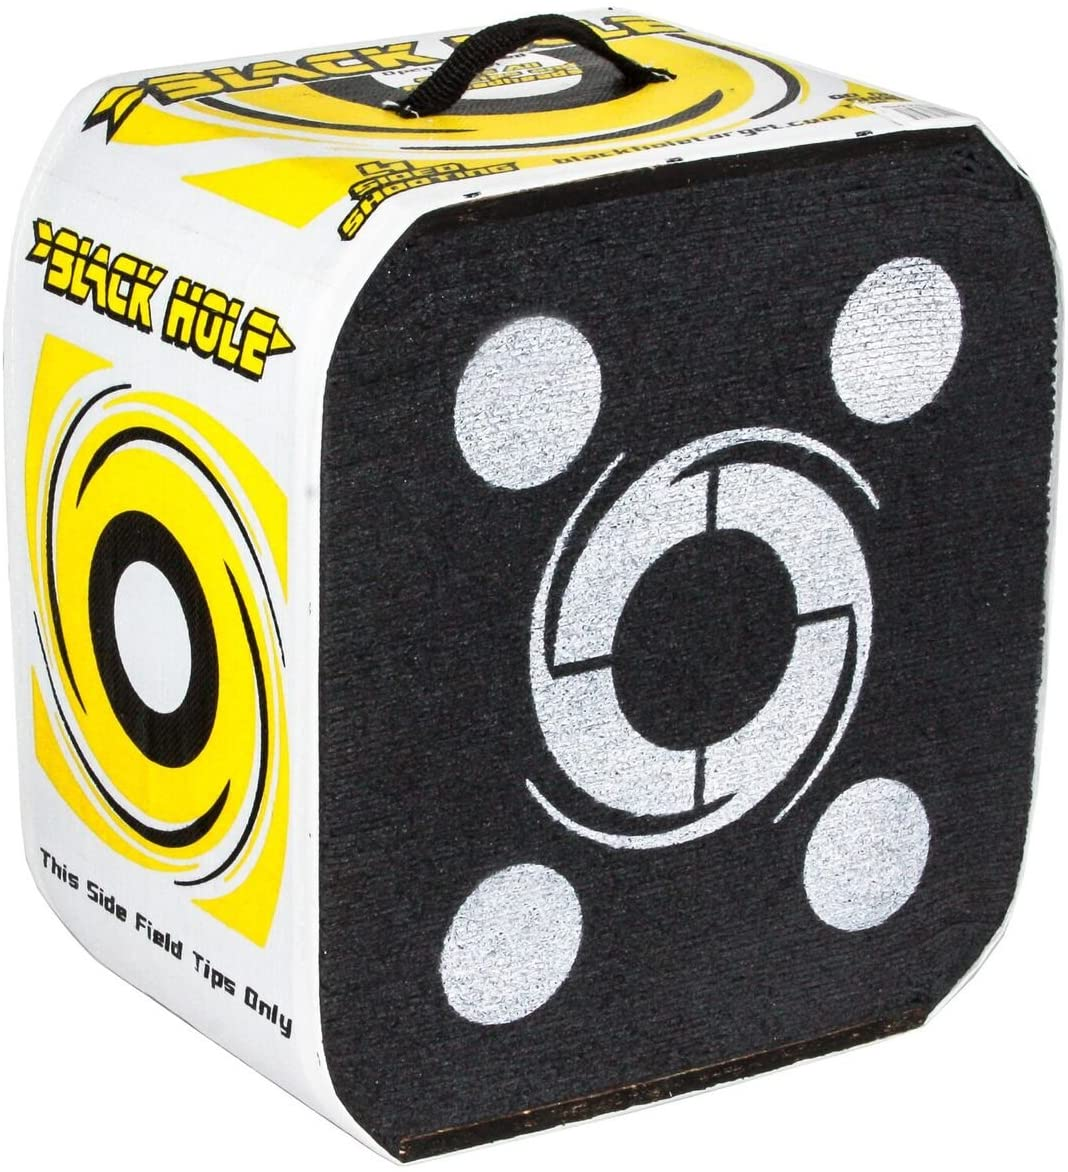 Black Hole 4-Sided Archery Target